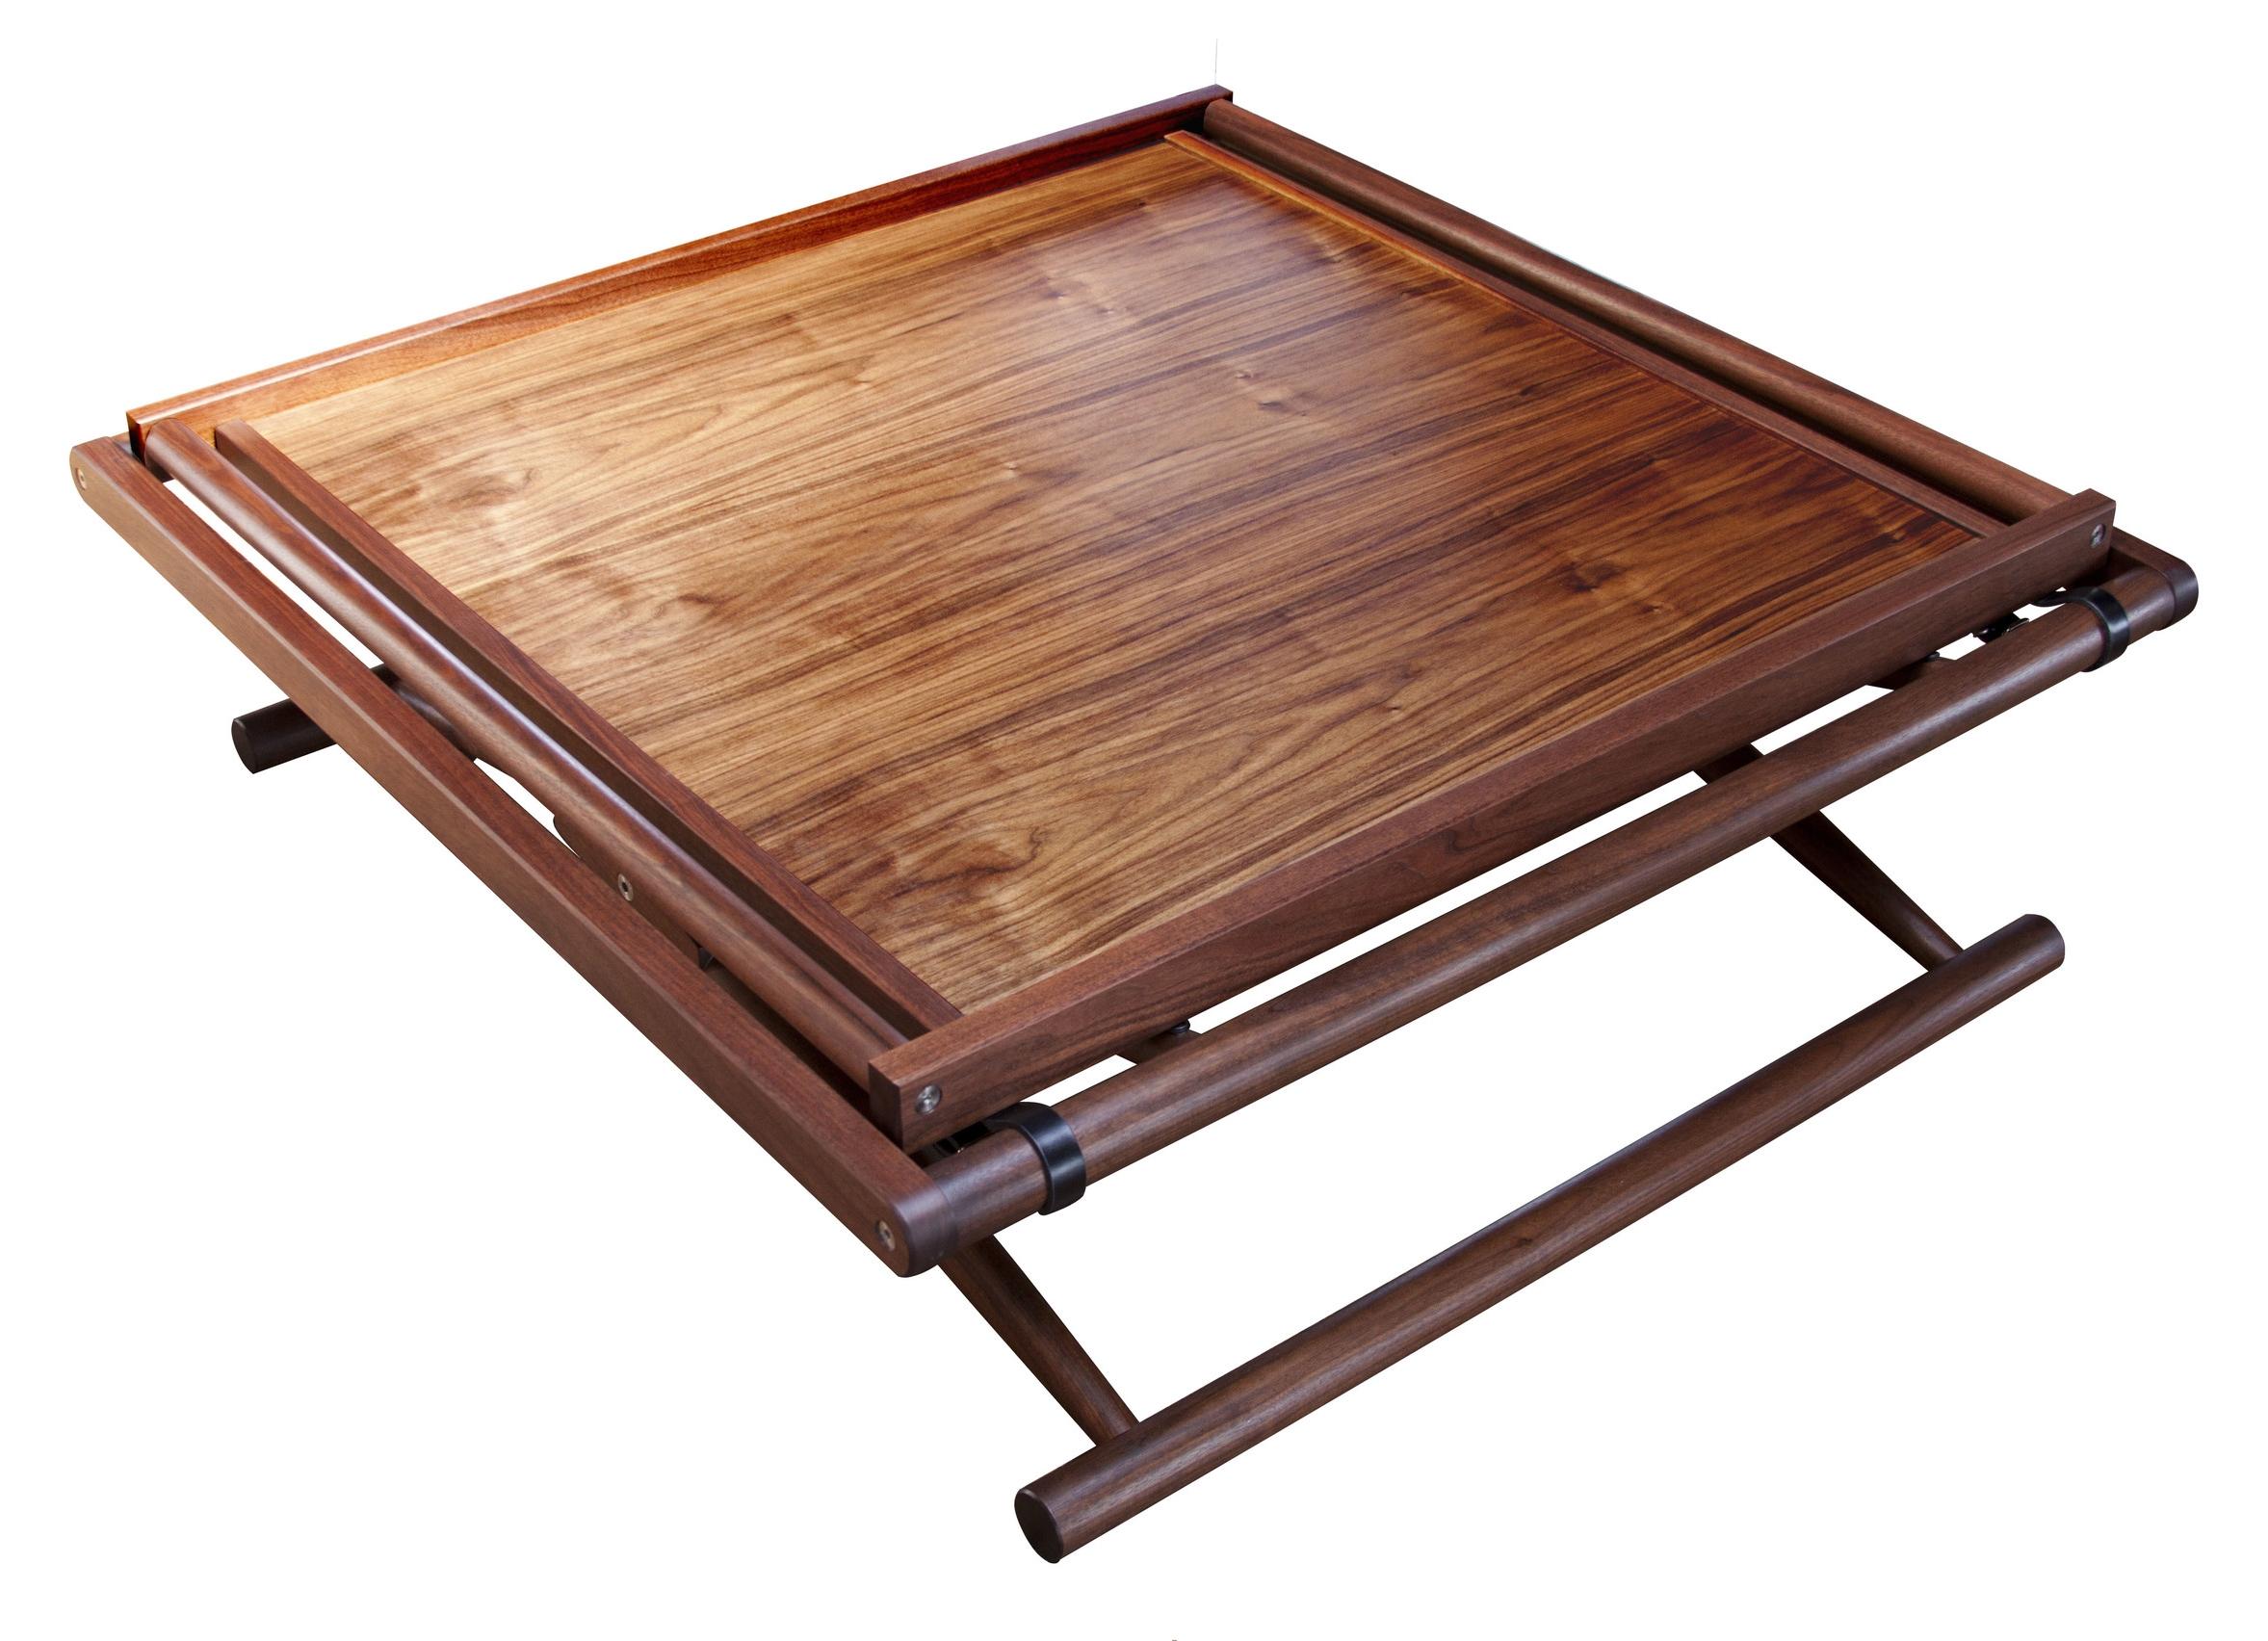 Matthiessen Coffee Table - Type 1